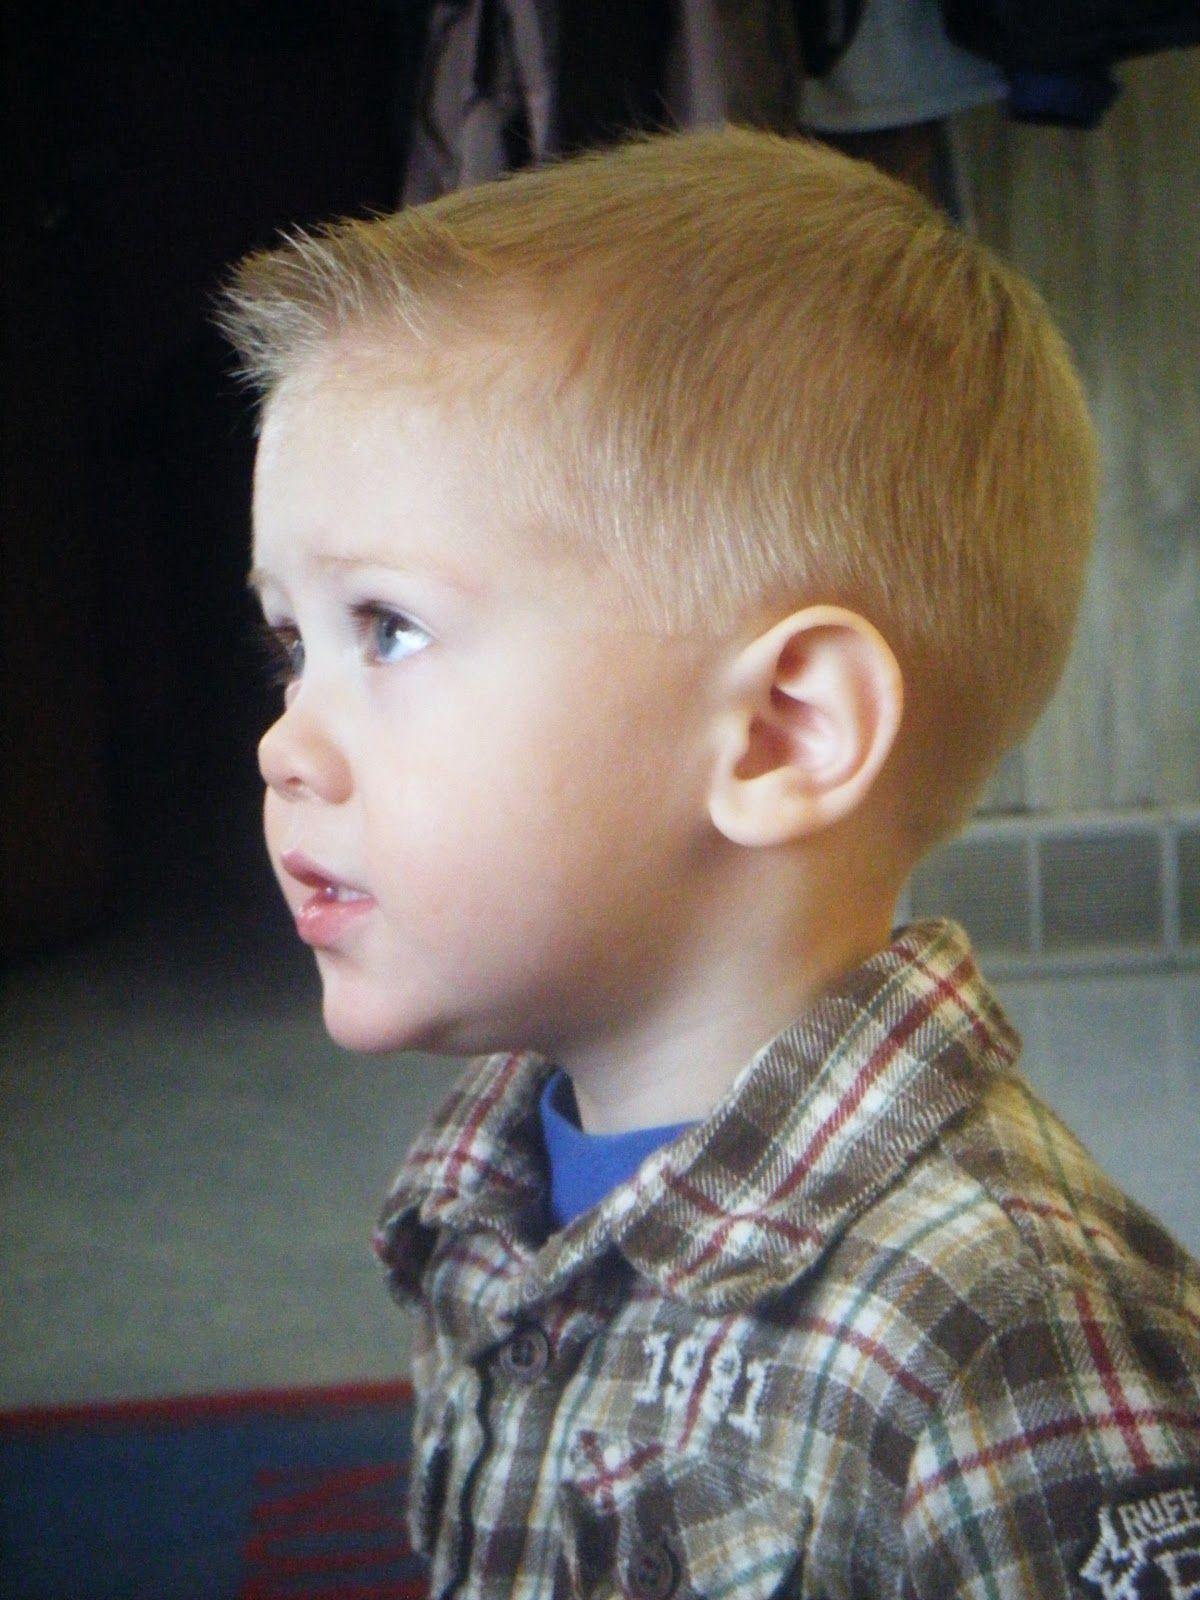 Dscf0840 Jpg 1200 1600 Boys Haircuts Boy Haircuts Short Little Boy Short Haircuts